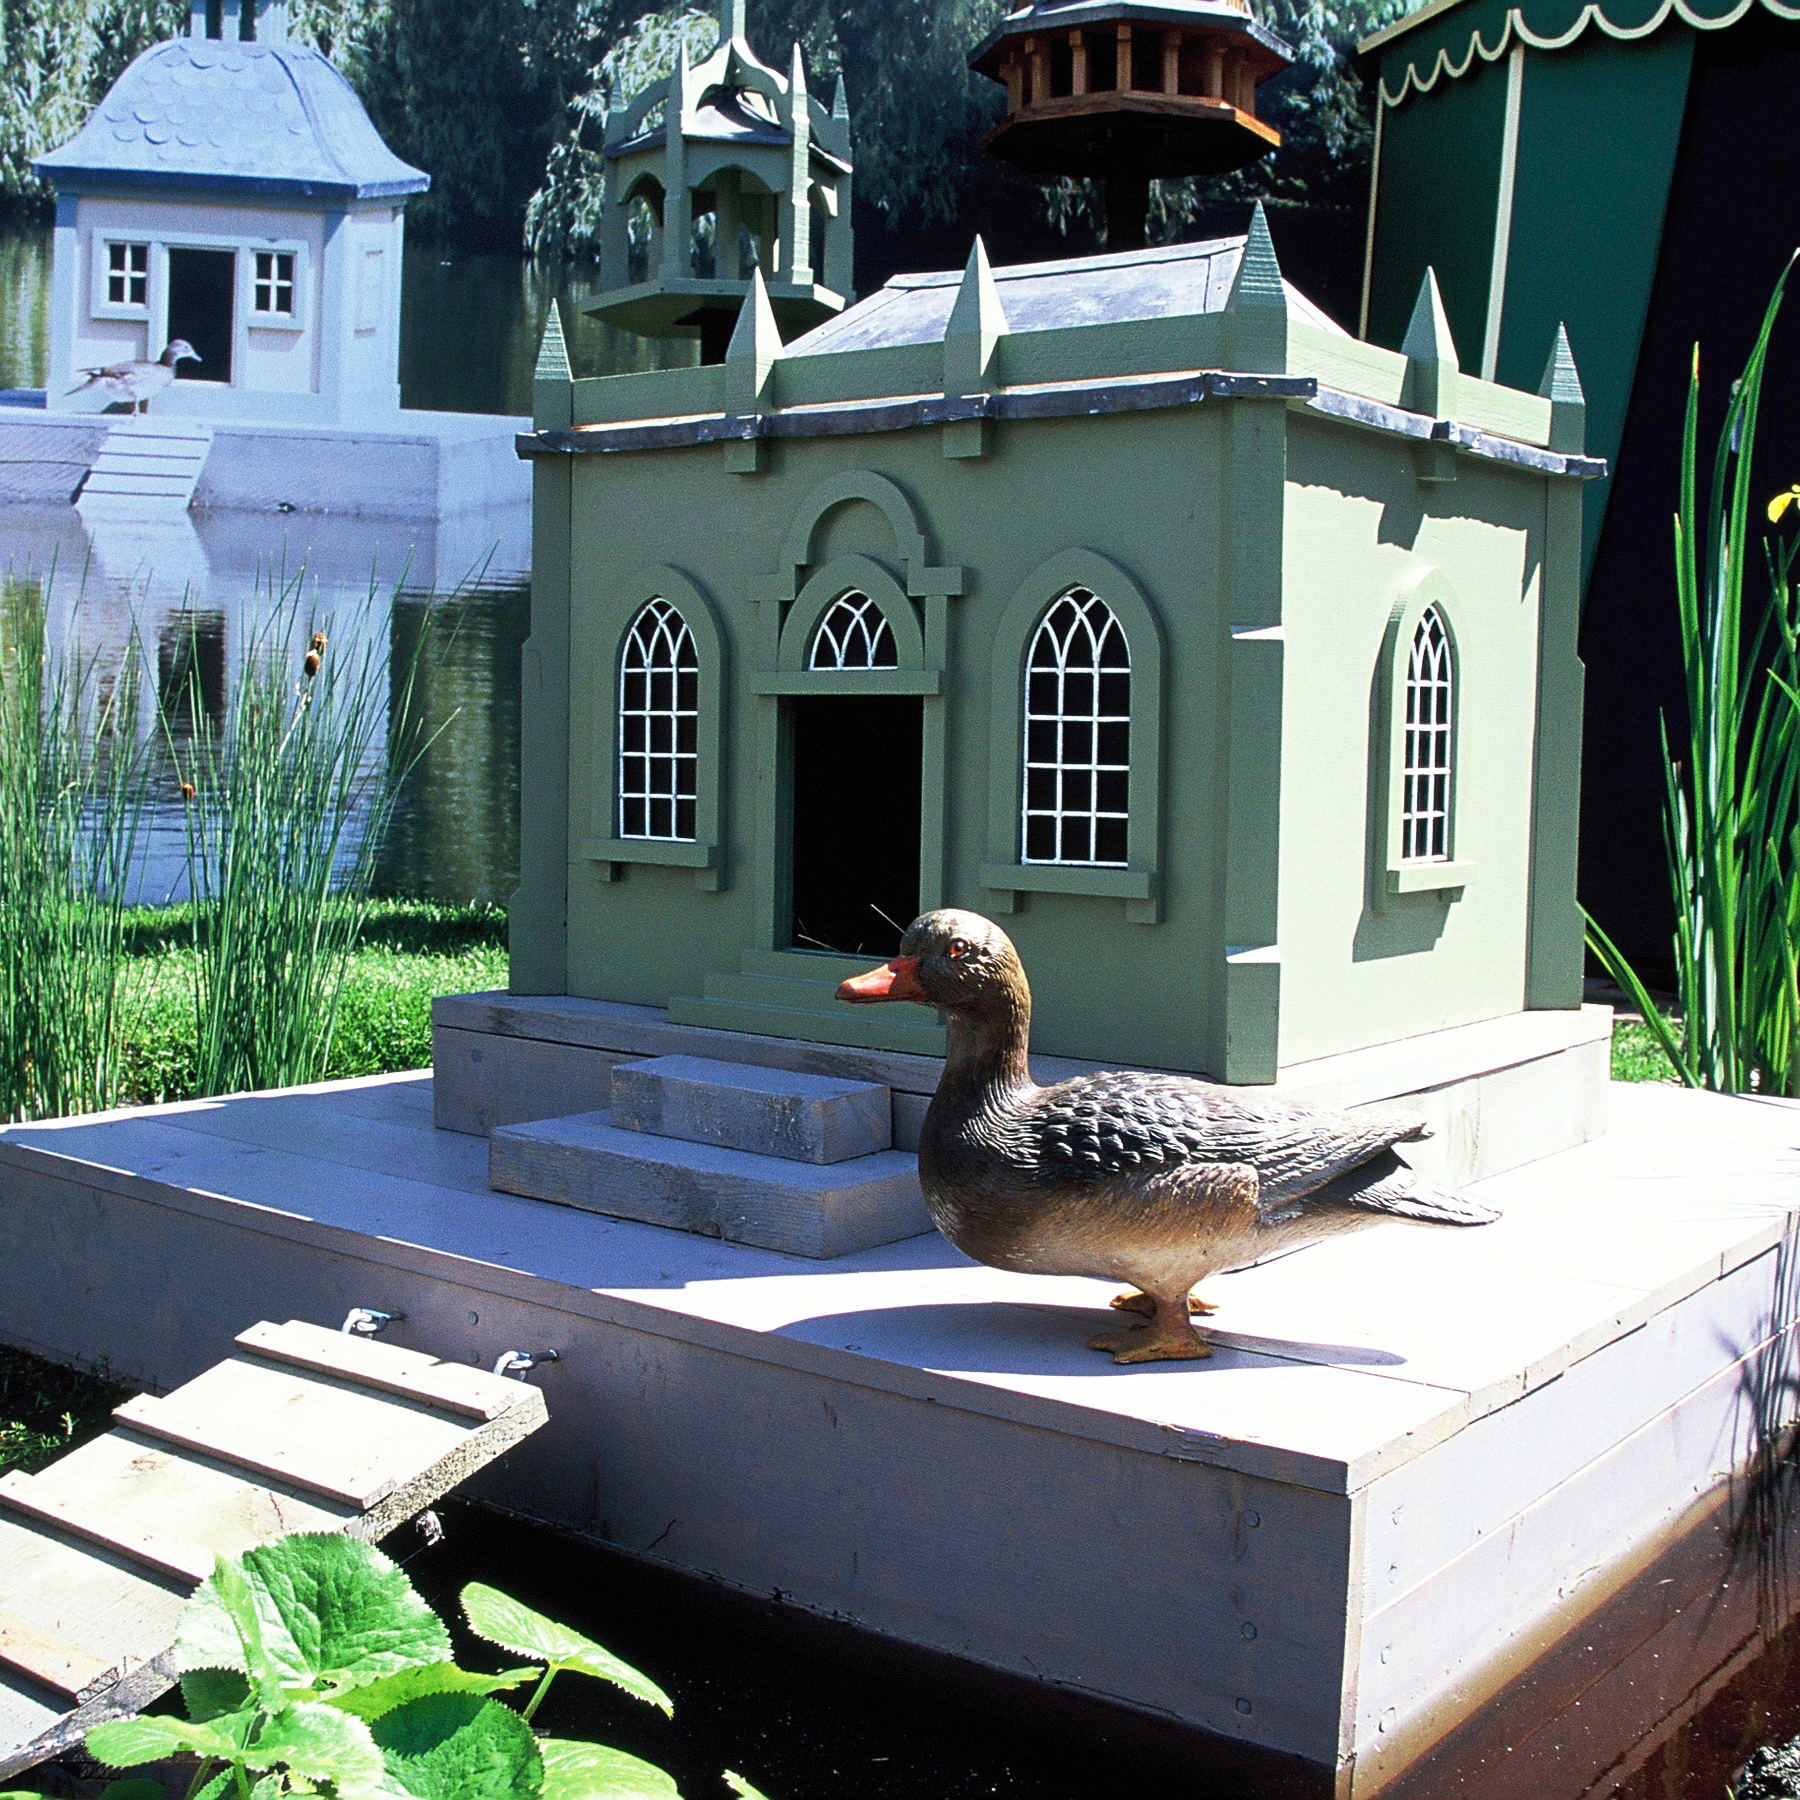 Heytesbury. Bespoke duck house.